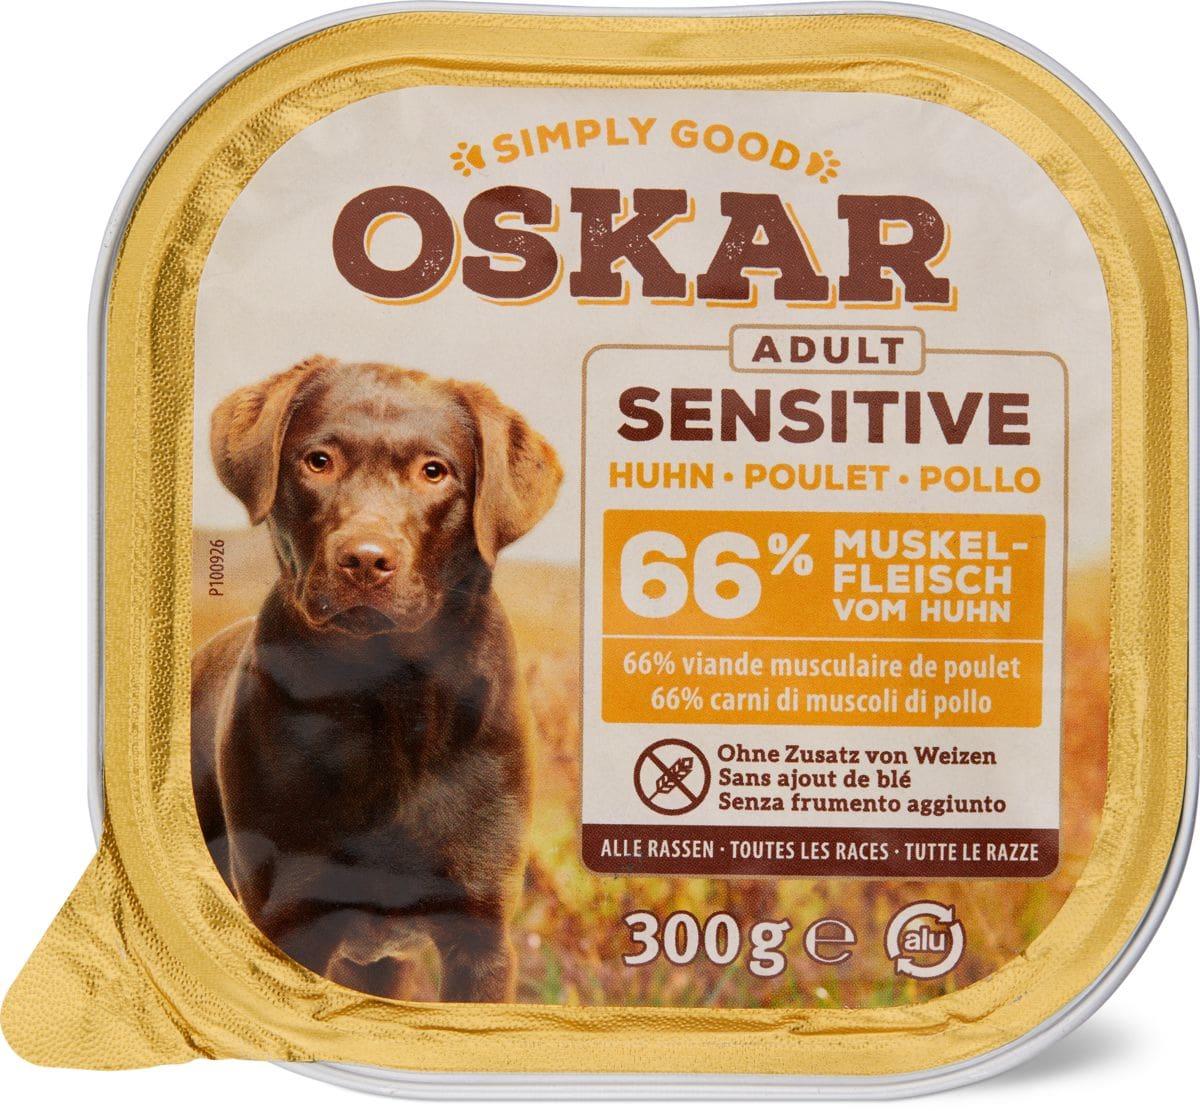 Oskar Sensitive Huhn